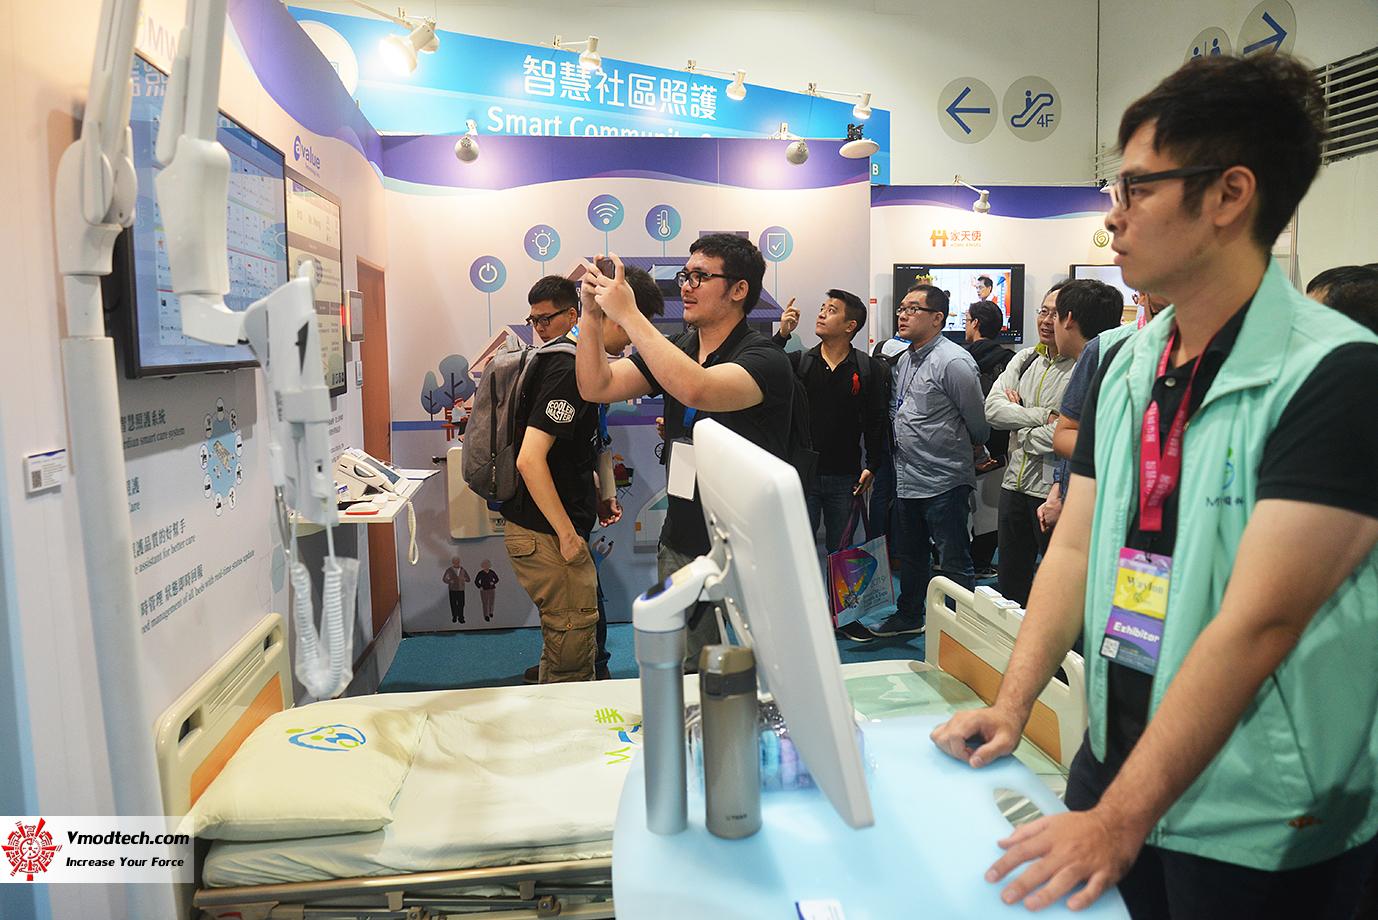 dsc 8811 เยี่ยมชมบูธ Smart Healthcare Expo กับเทคโนโลยีระบบการแพทย์และการดูแลสุขภาพอัจฉริยะในงาน 2019 SMART CITY SUMMIT & EXPO ณ กรุงไทเป ประเทศไต้หวัน